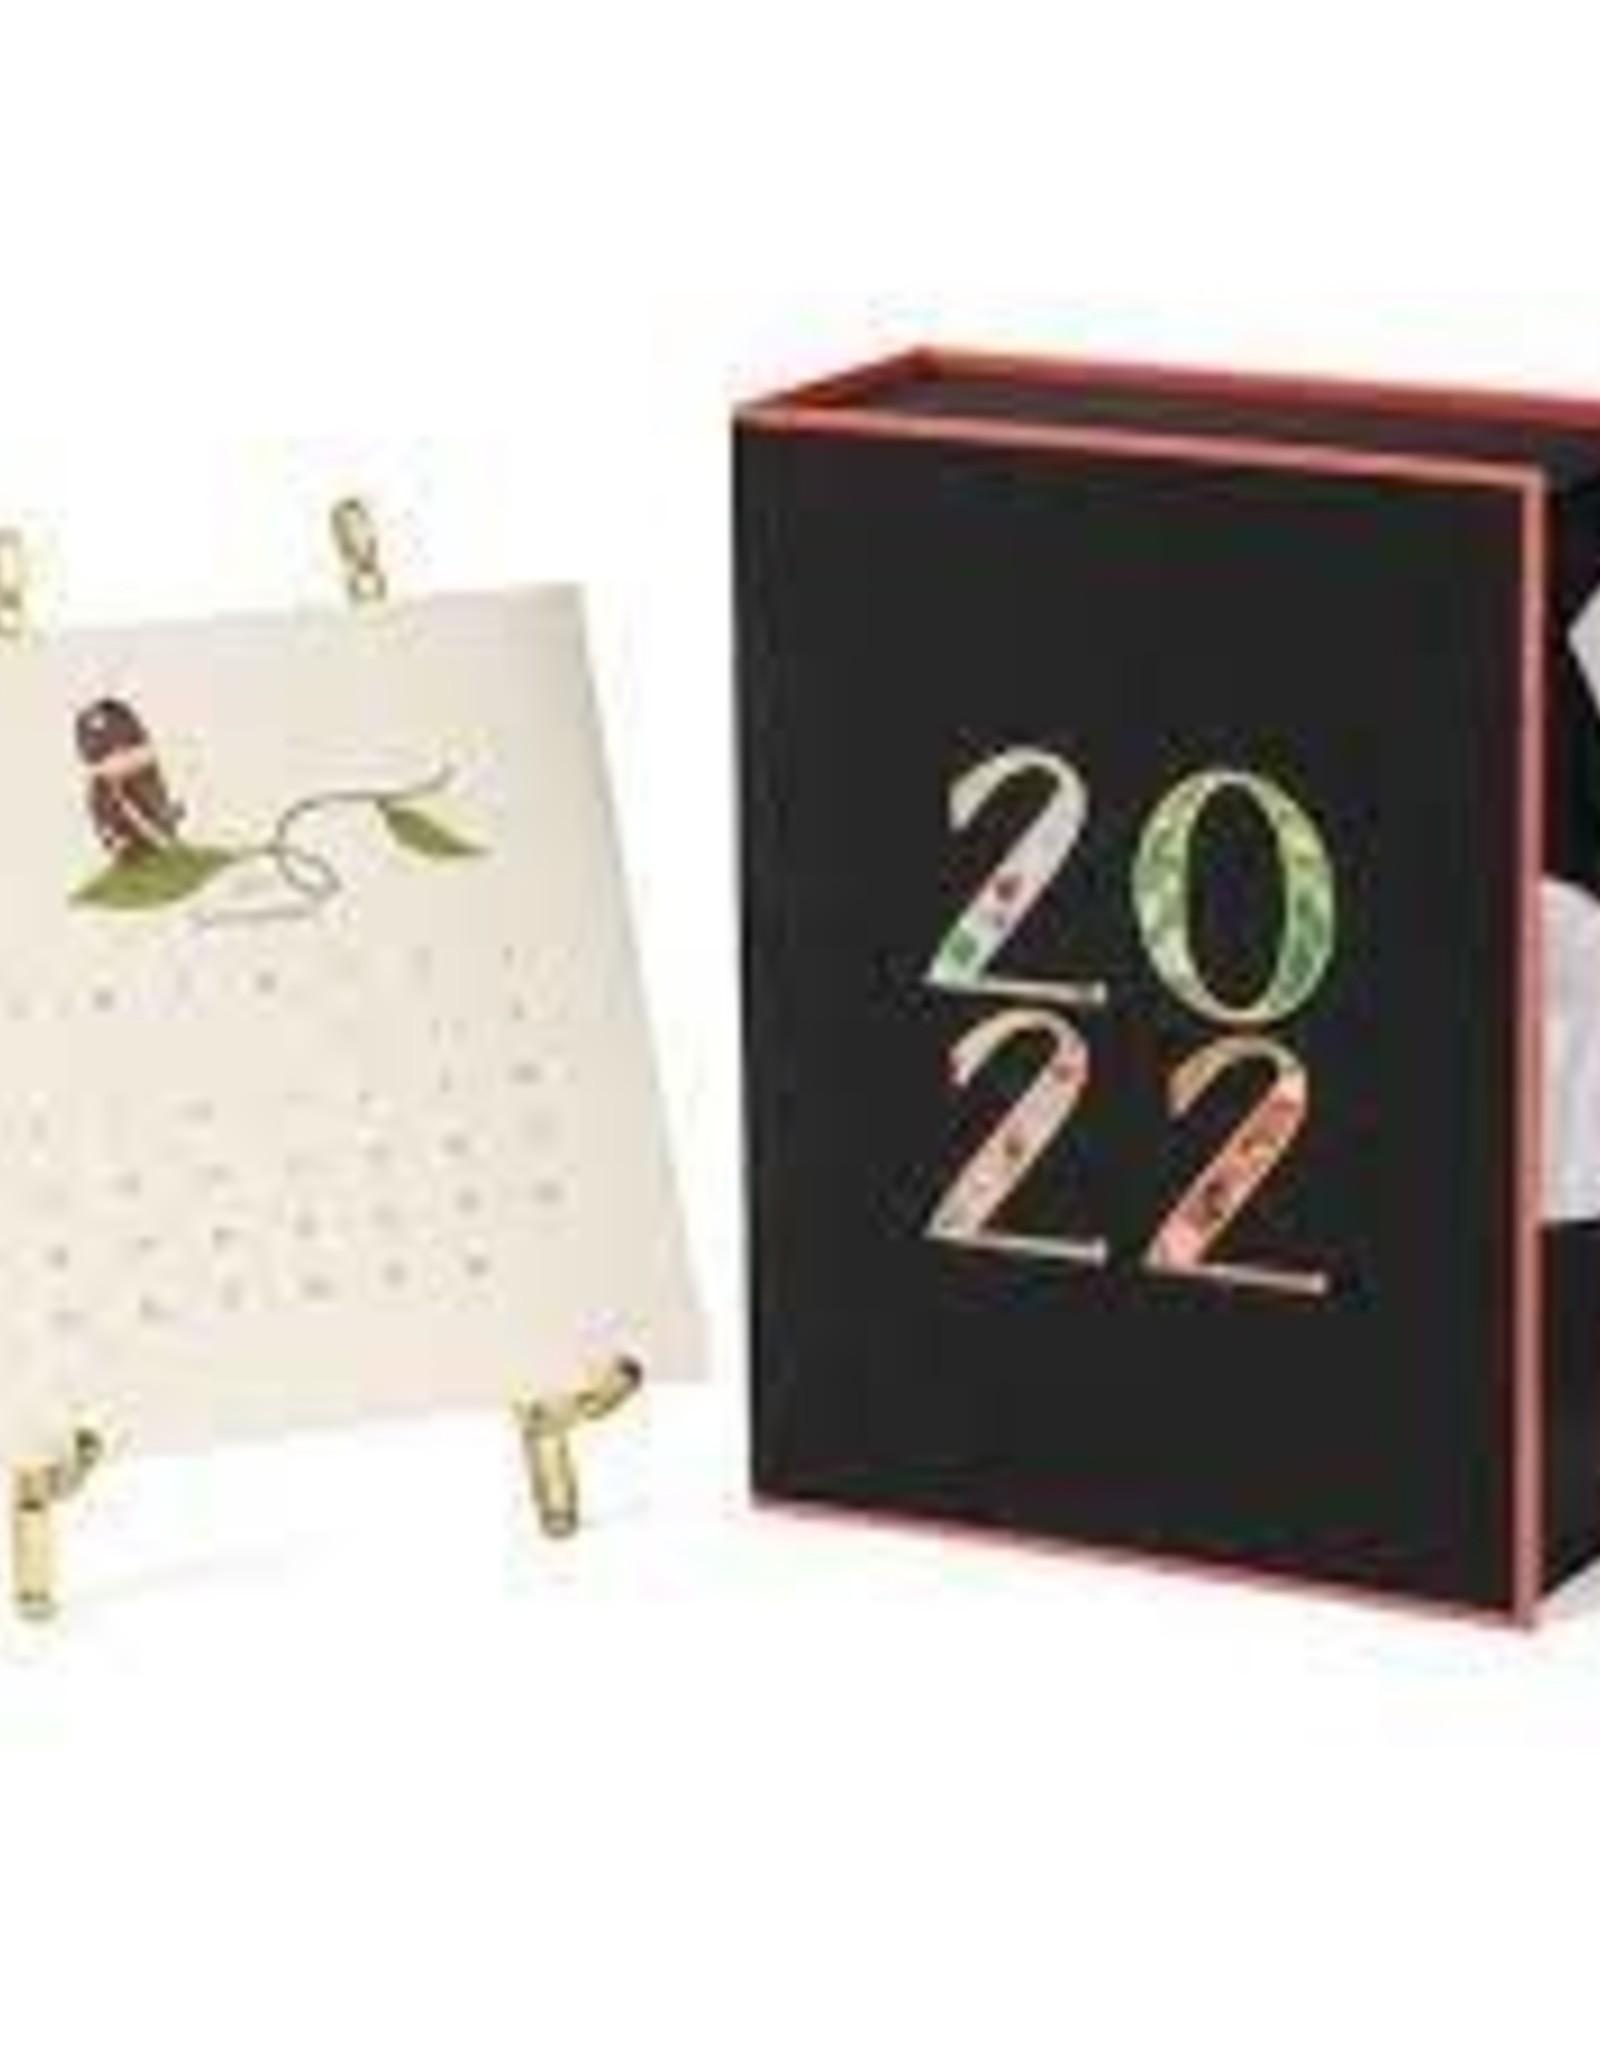 Karen Adams Designs 2022 Desk Calendar with Gold Easel